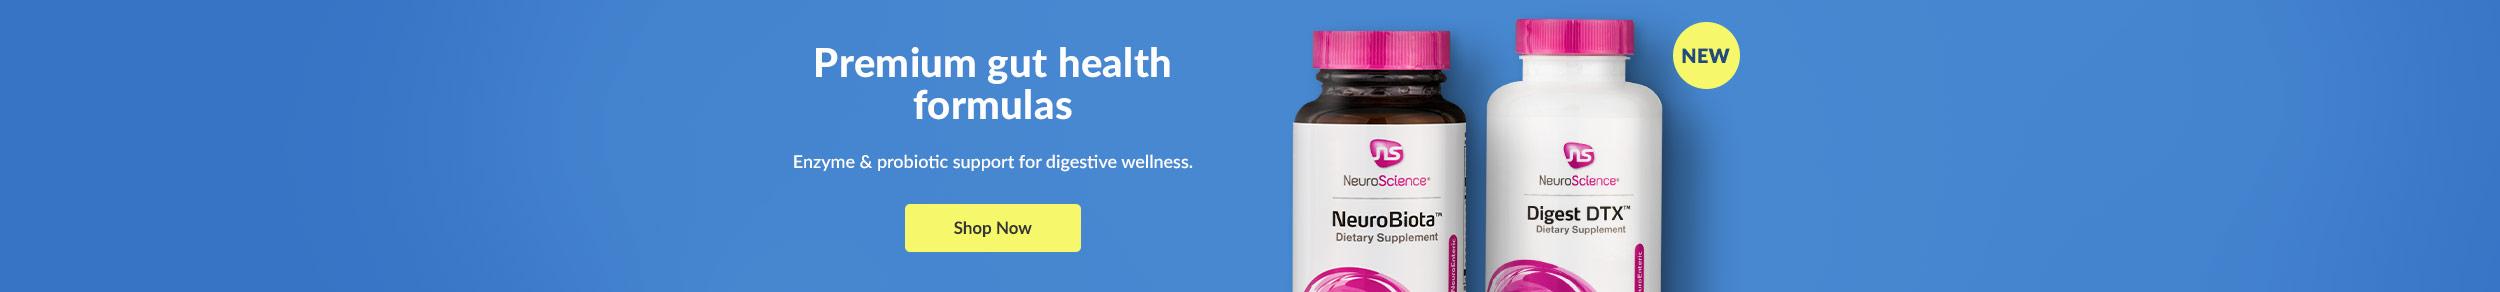 Premimum gut health formulas - Enzyme & probiotic support for digestive wellness. SHOP NOW!